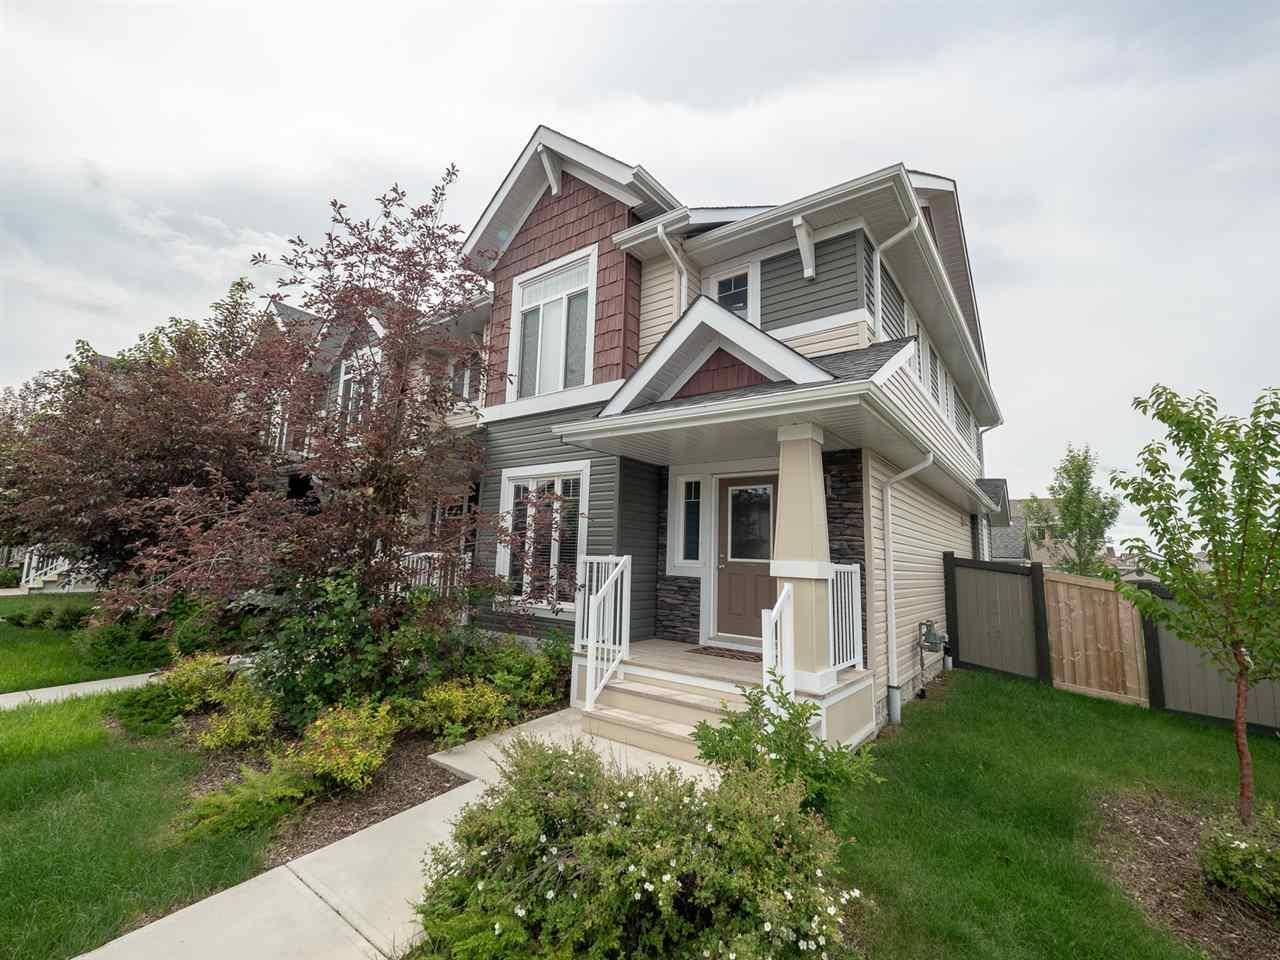 House for sale at 704 176 St Sw Edmonton Alberta - MLS: E4167890